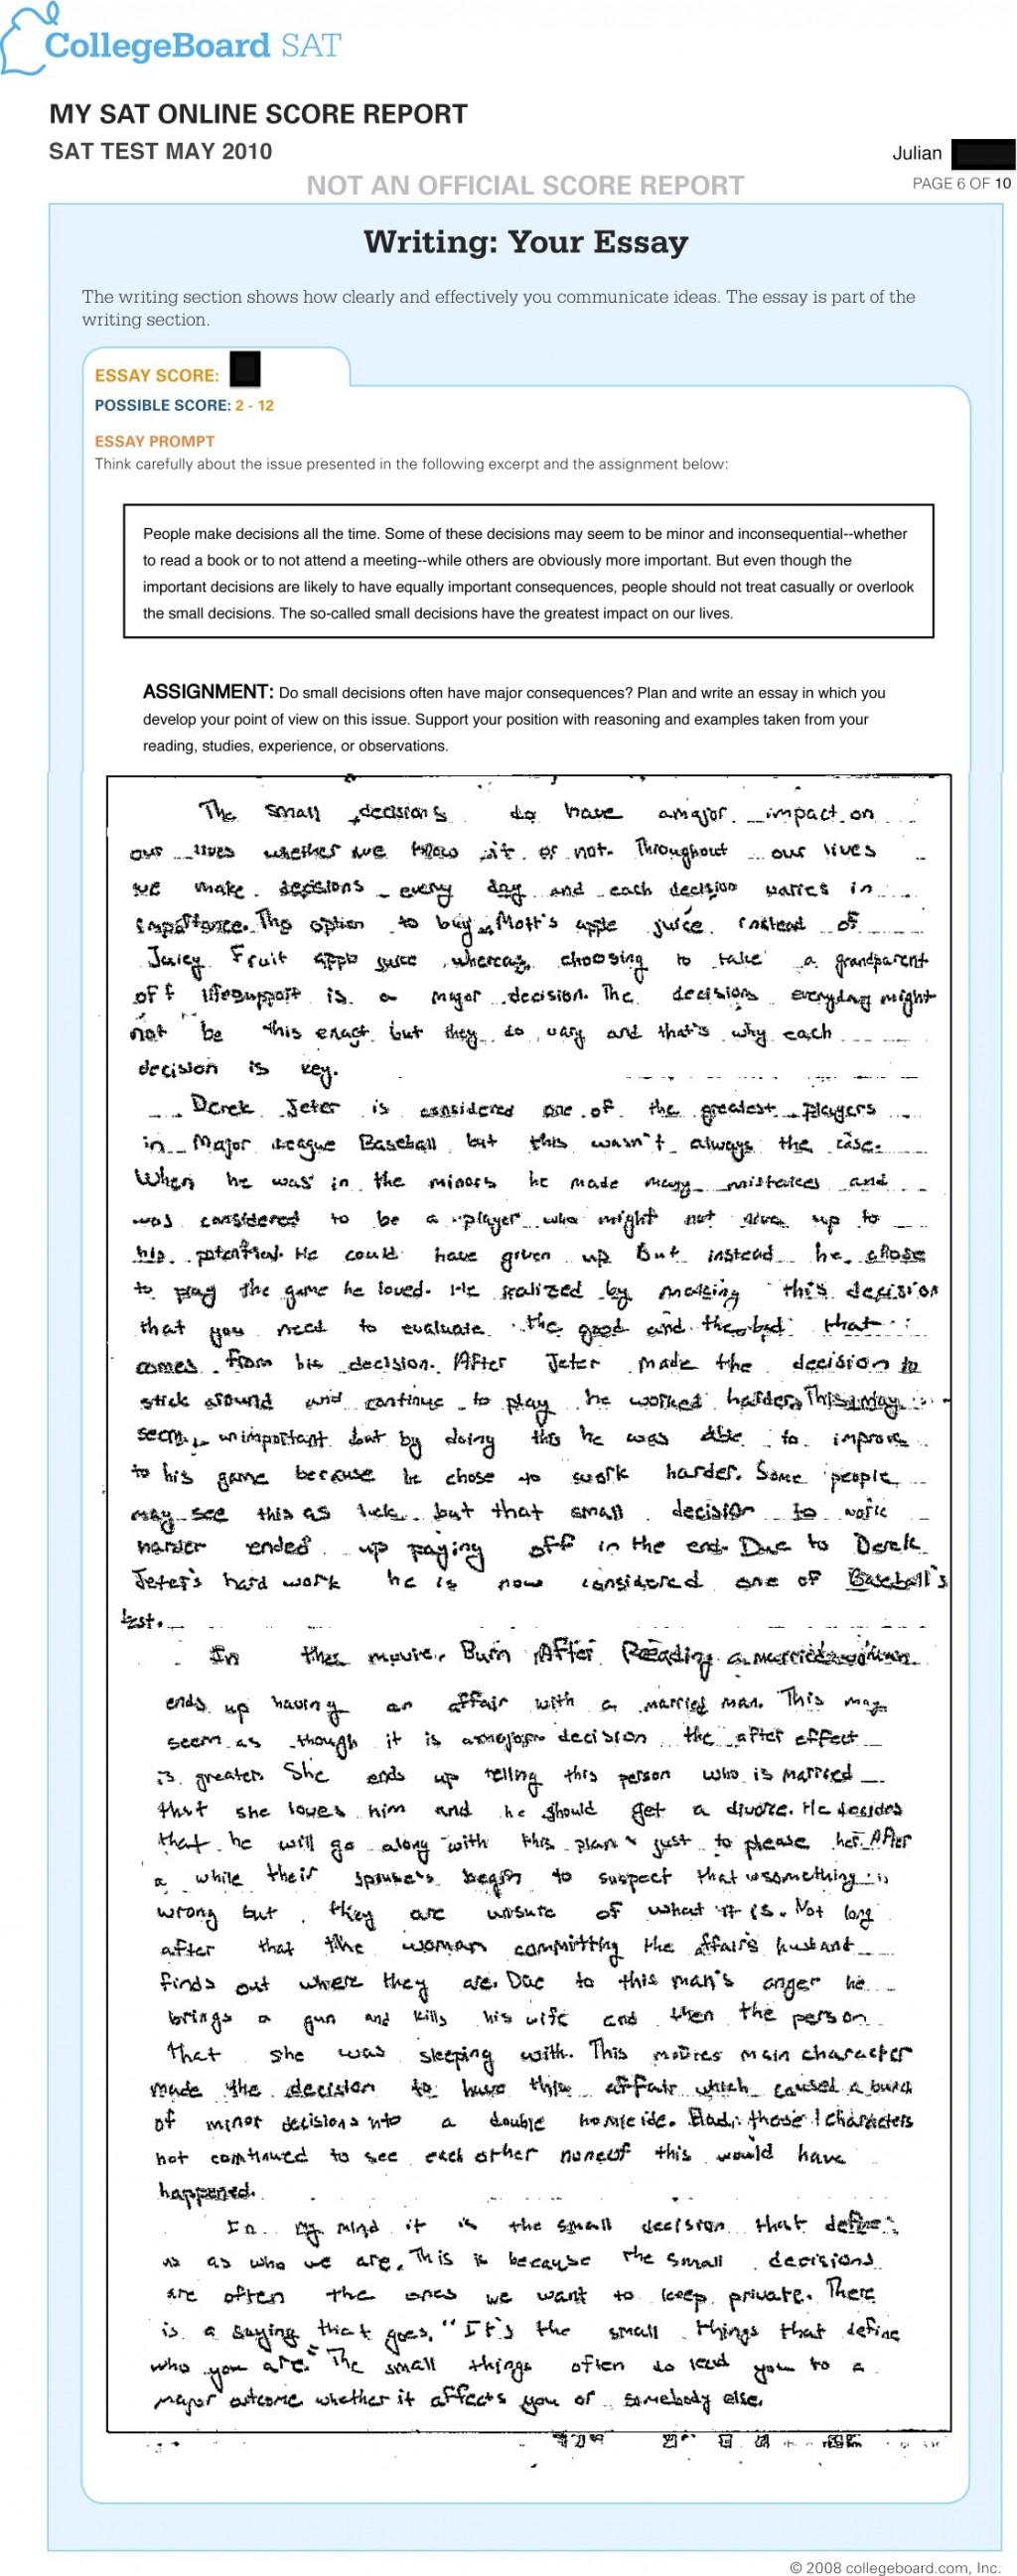 015 Essay Example New Sat Prompts Jr May Impressive 2017 Pdf Large